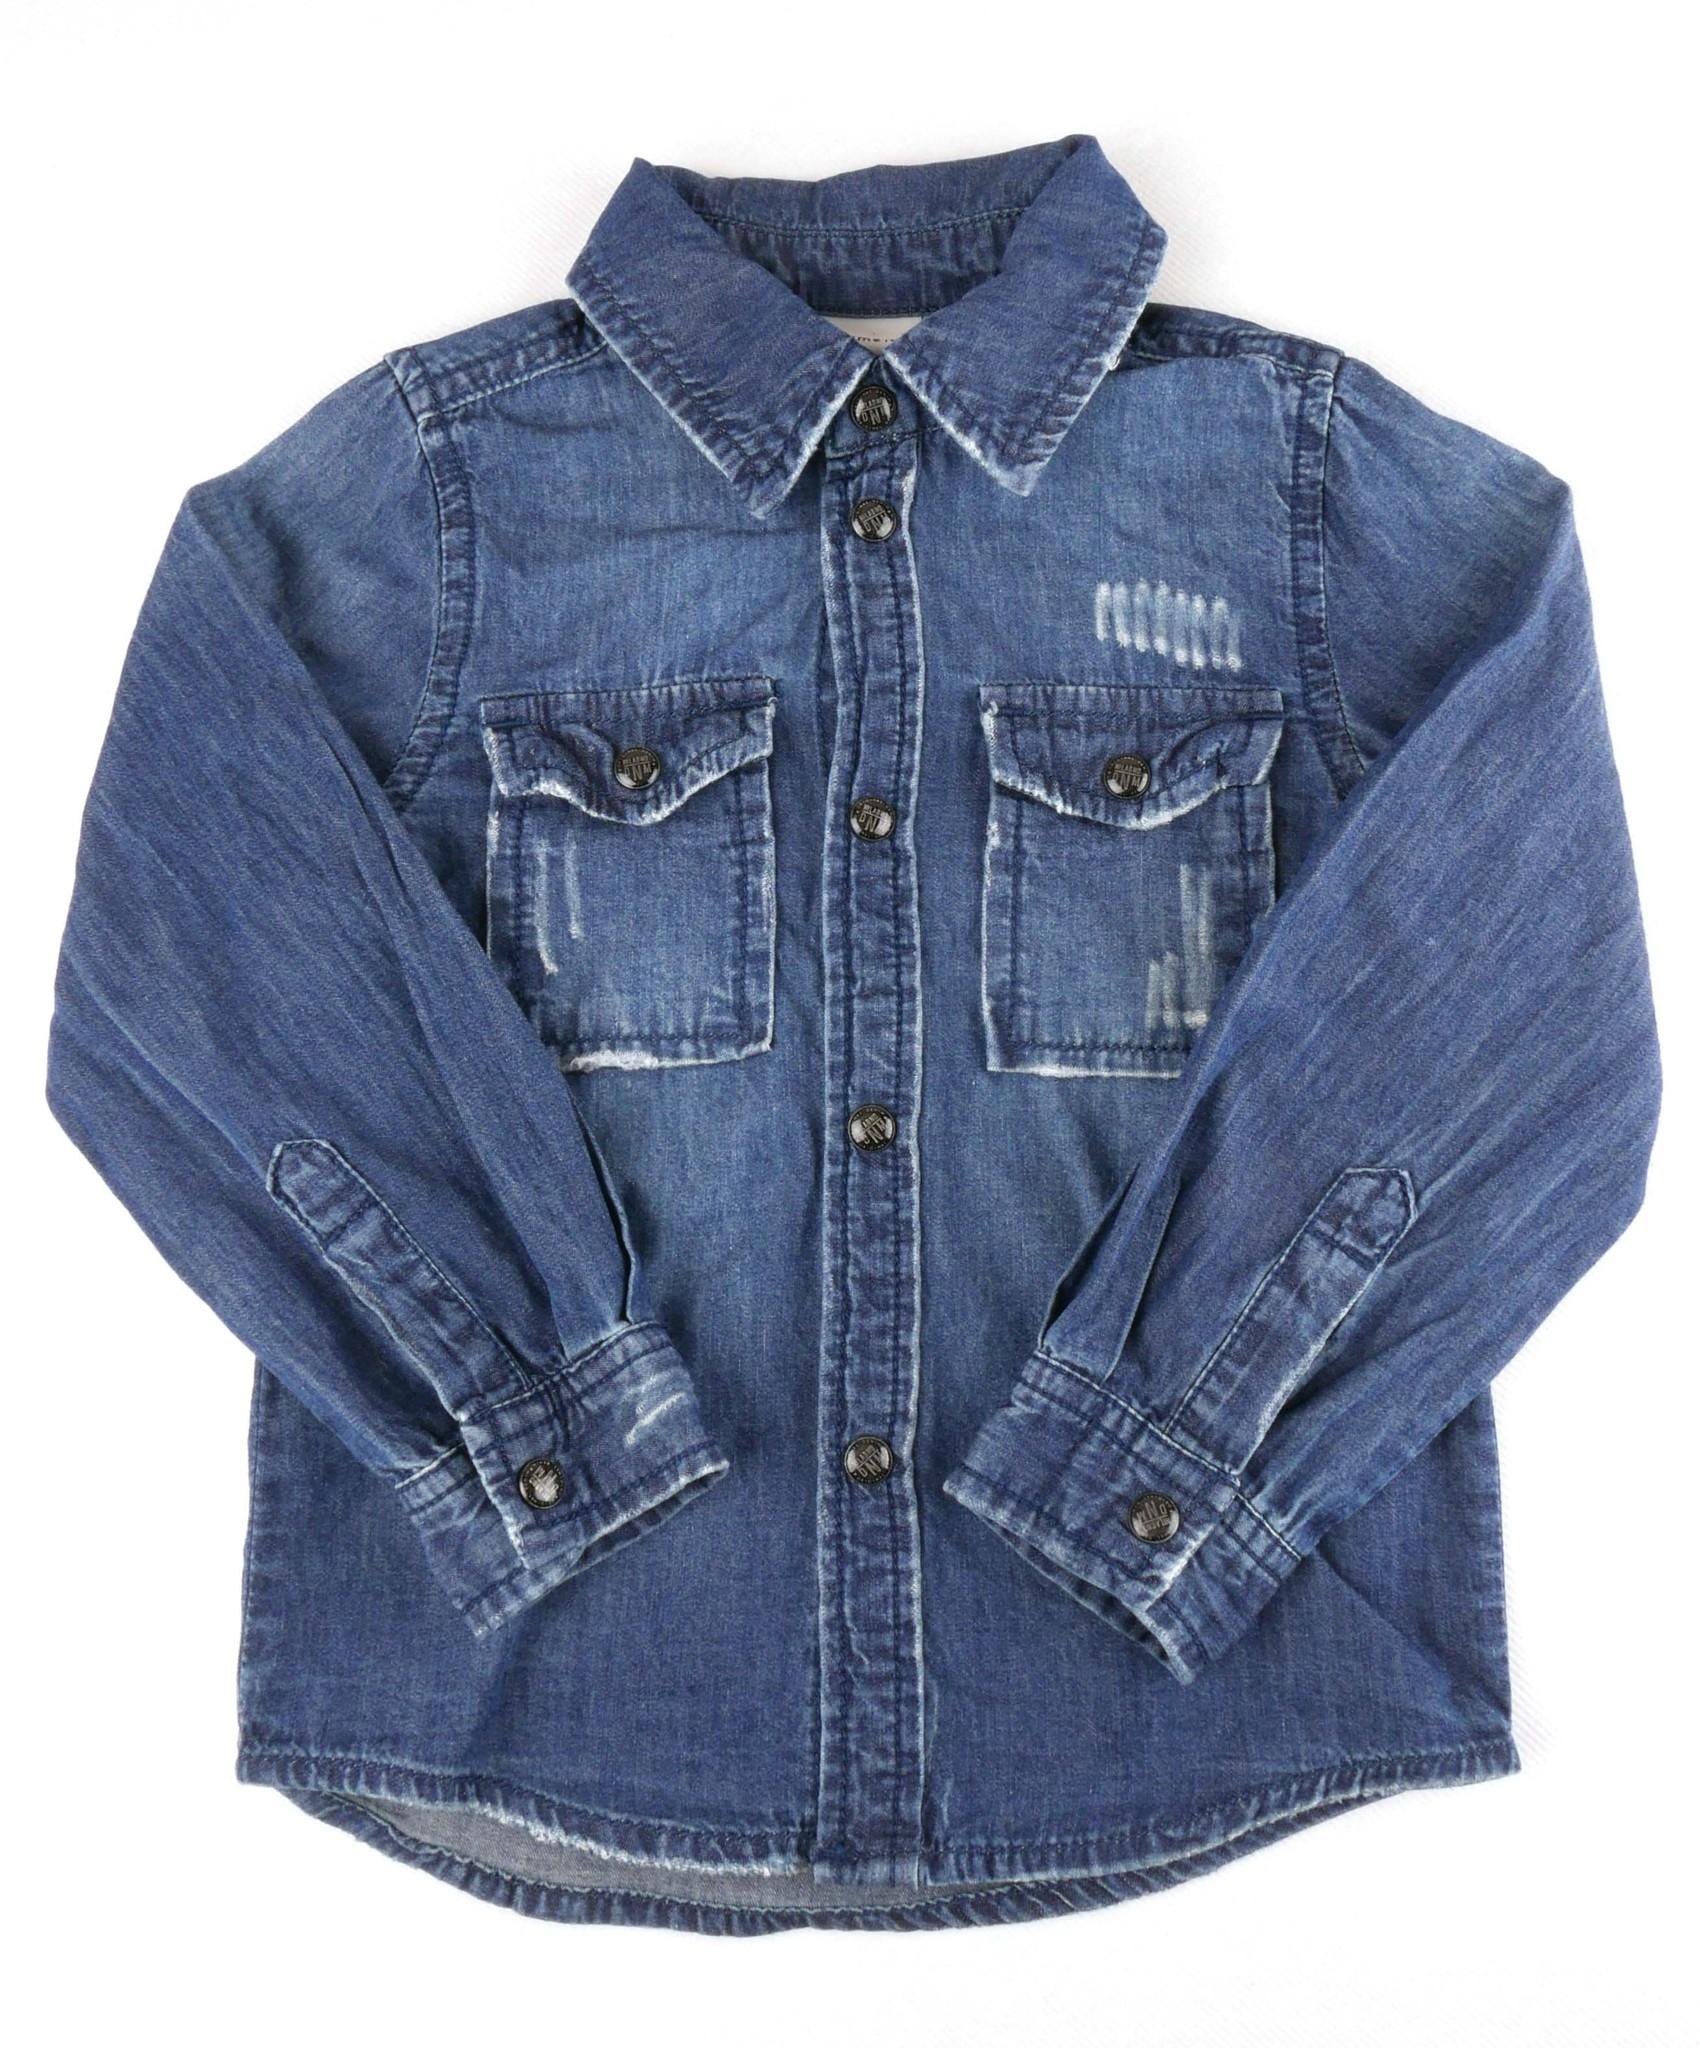 Jeans hemd Name It-1